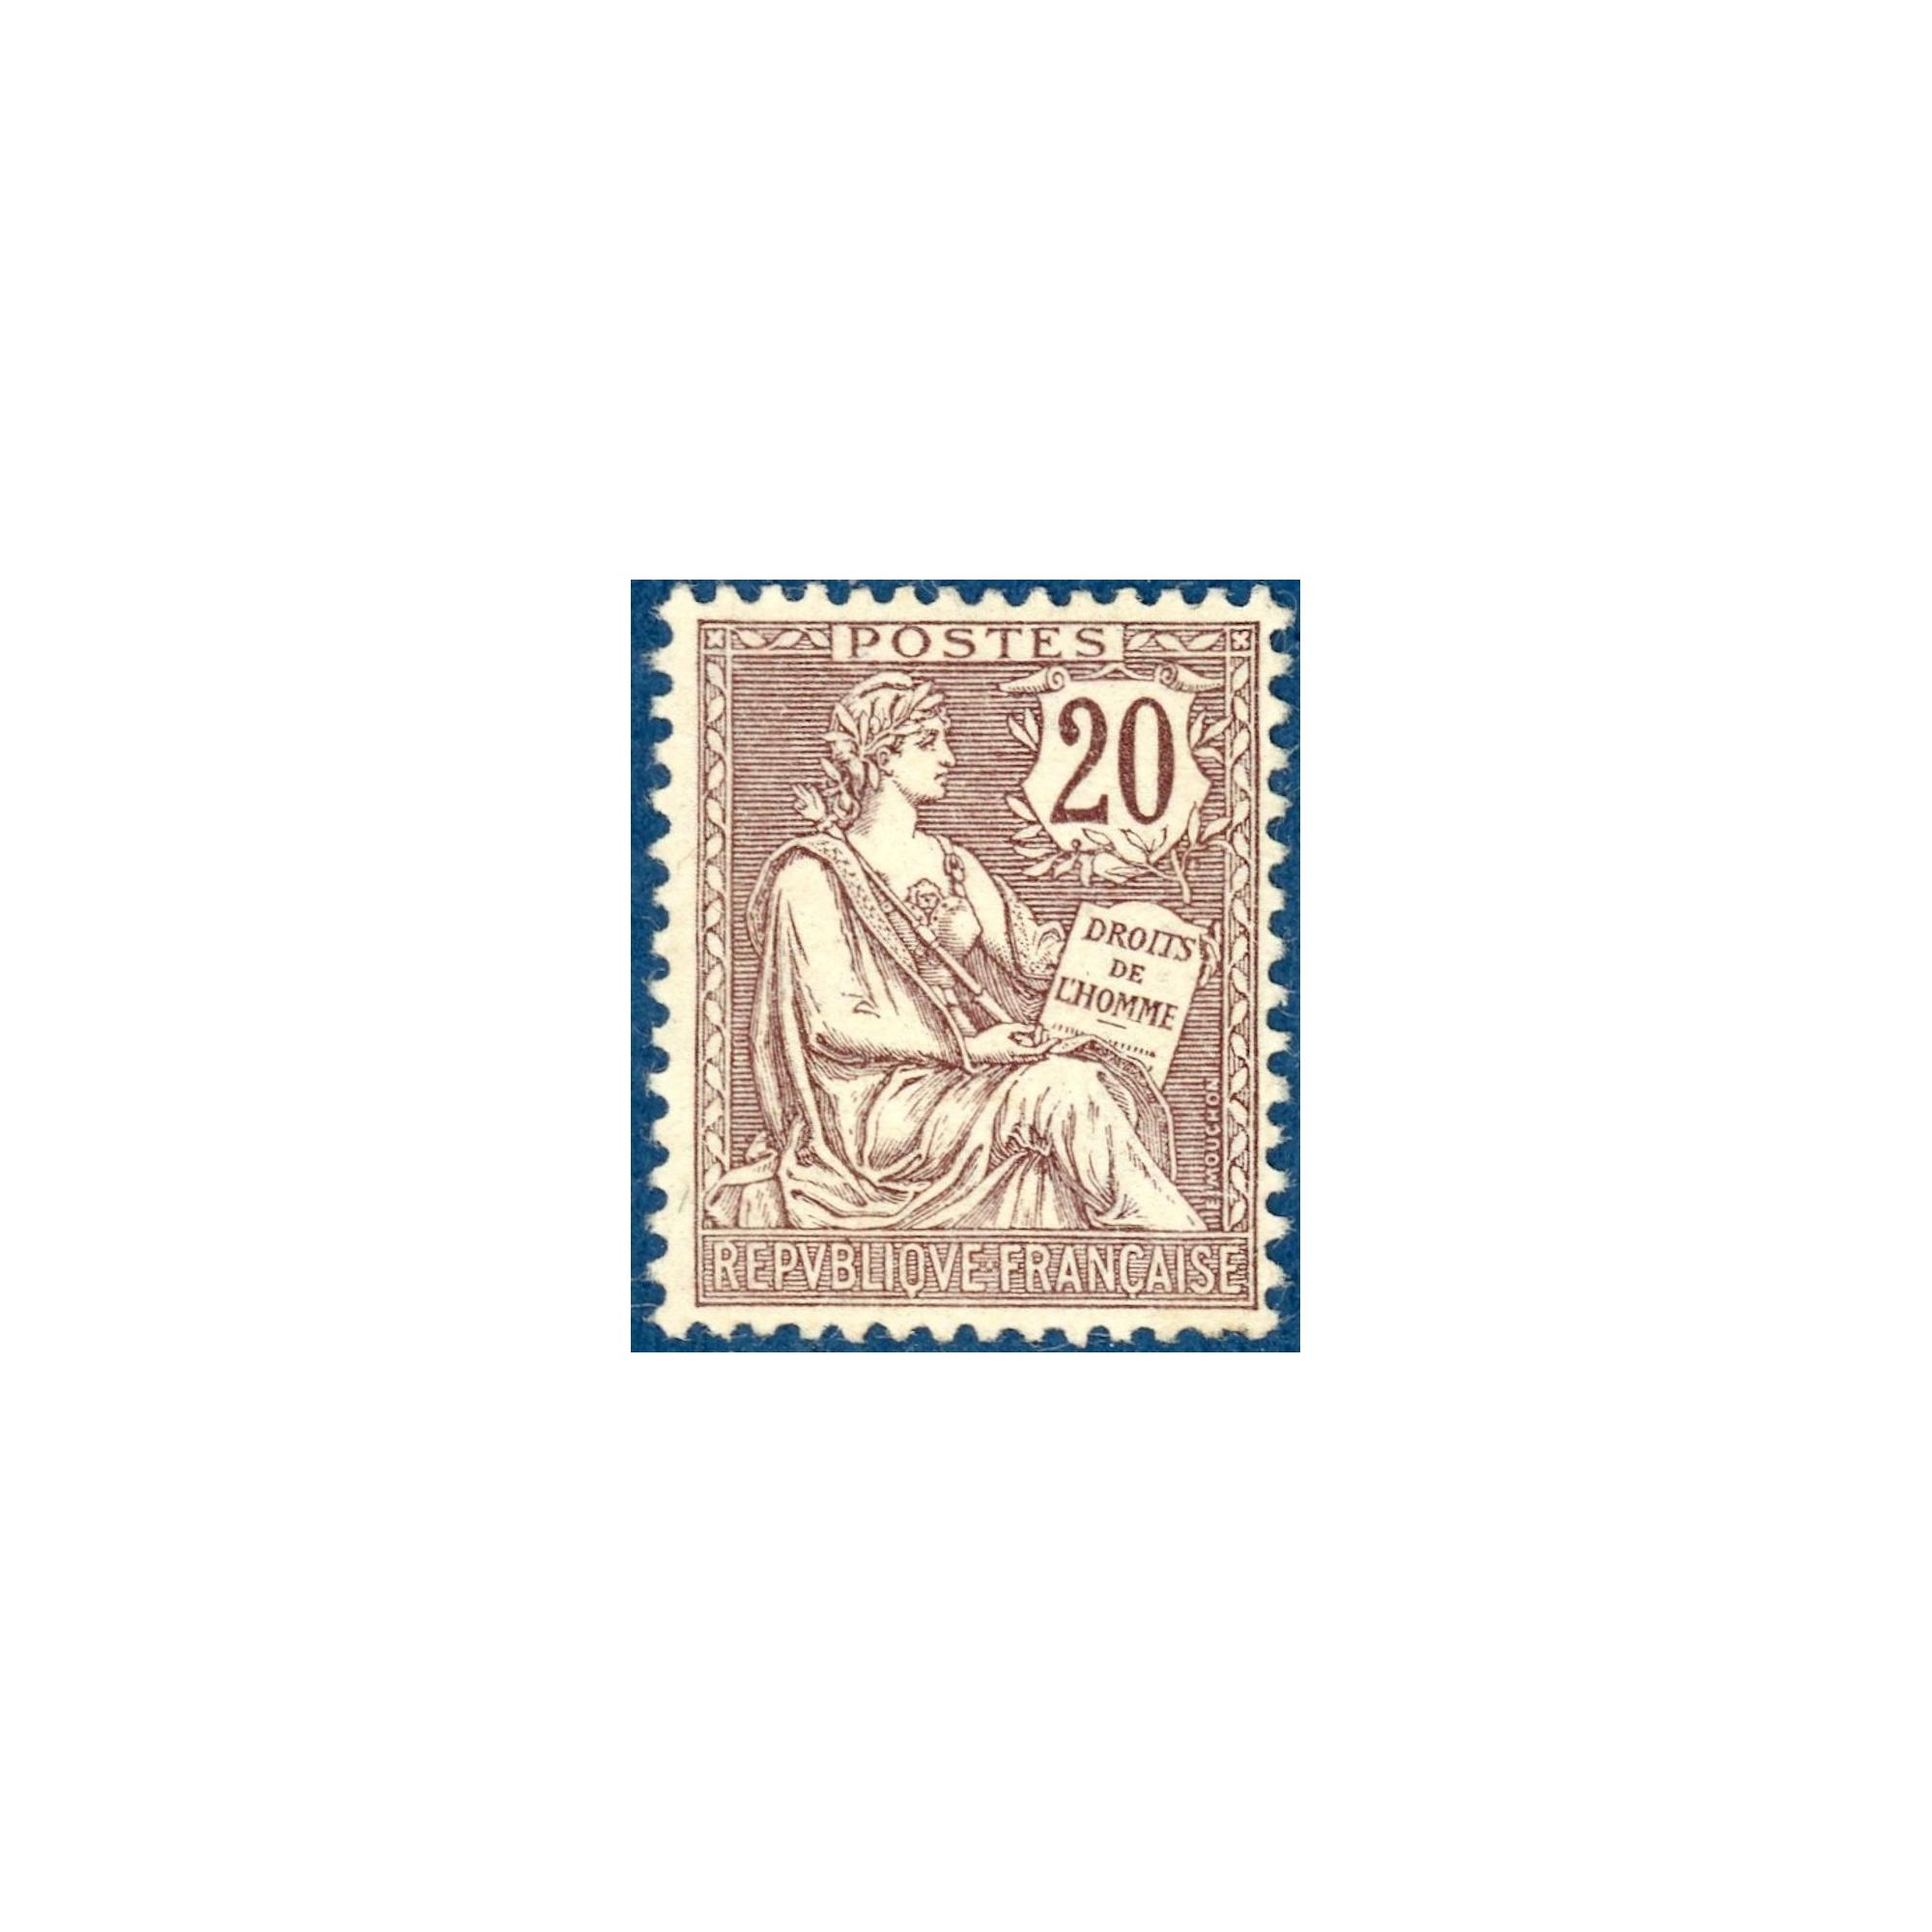 N°126 TYPE MOUCHON RETOUCHE 20C BRUN-LILAS, TIMBRE NEUF ** 1902